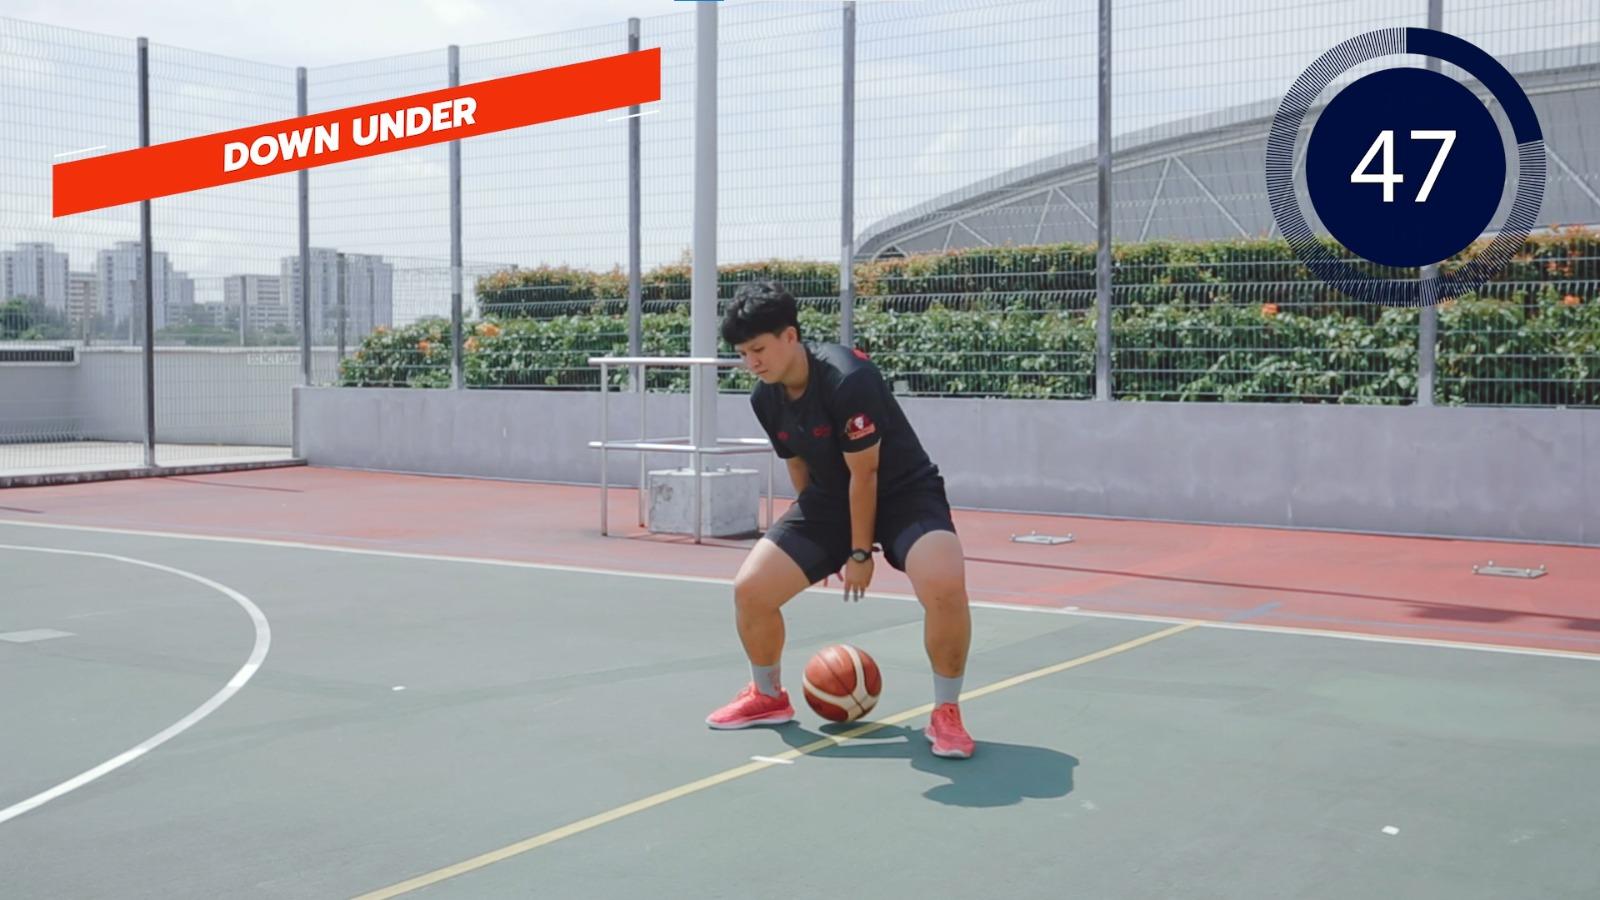 basketball down under